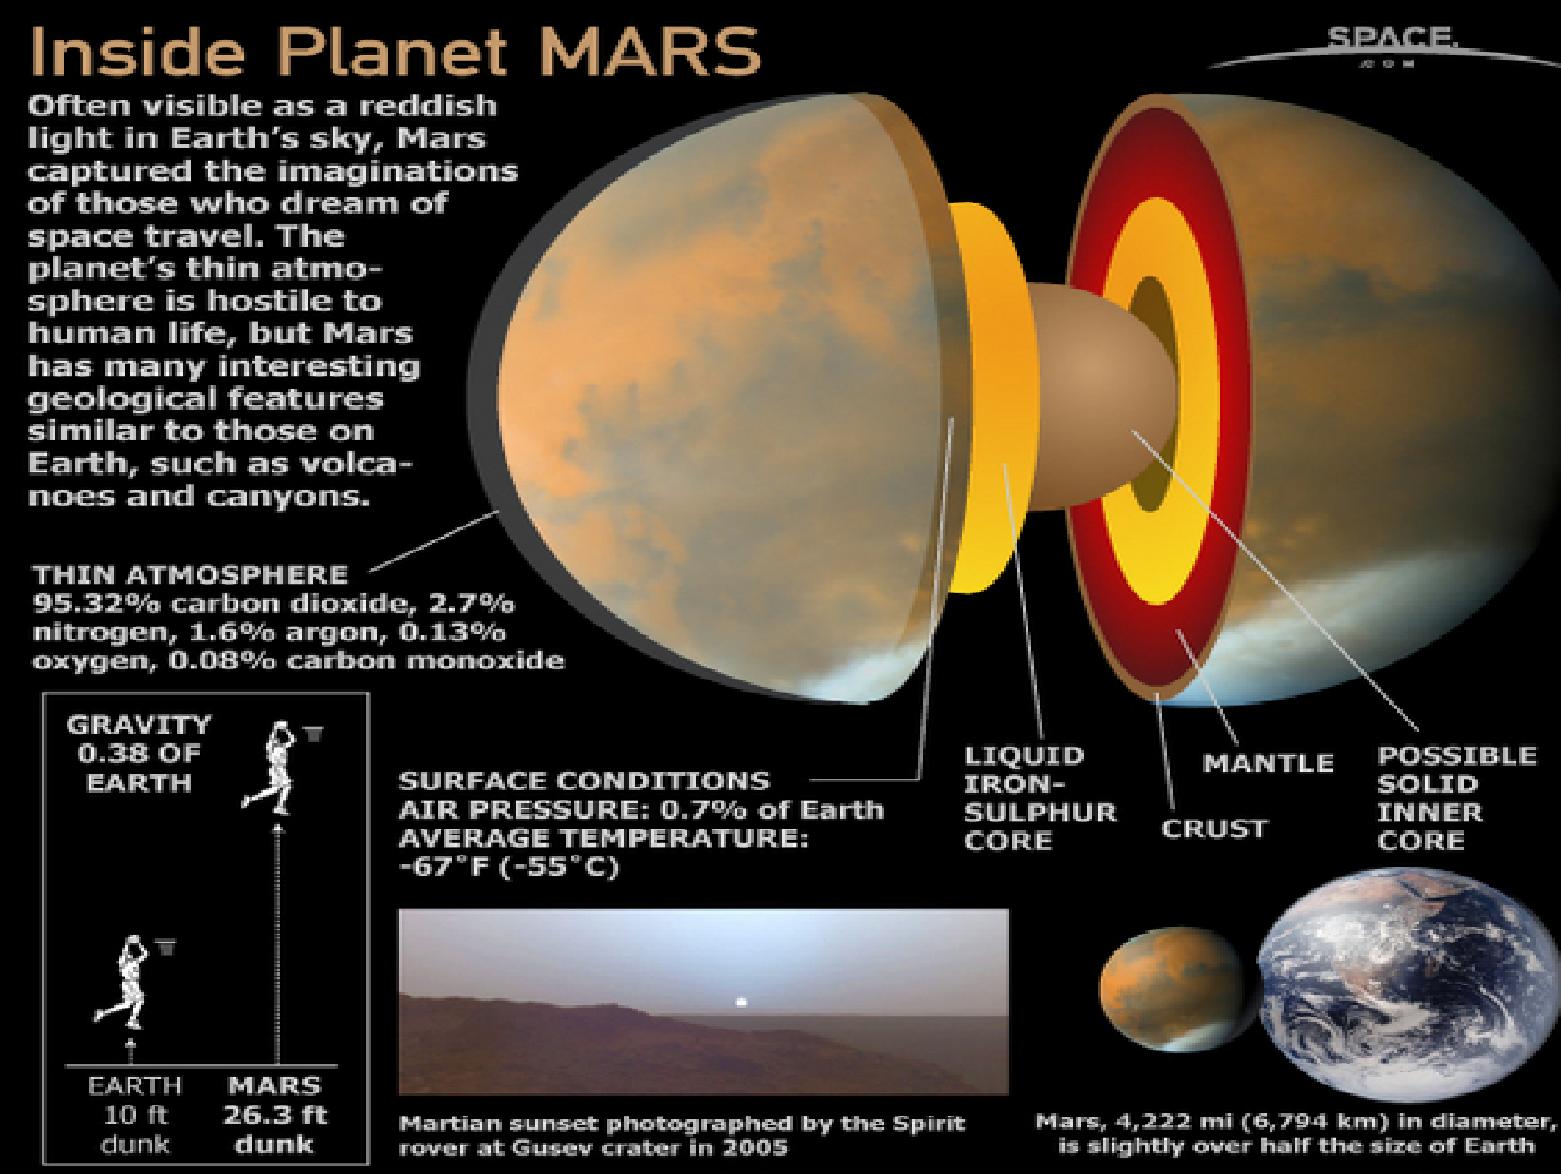 planet mars core crust mantel - photo #23